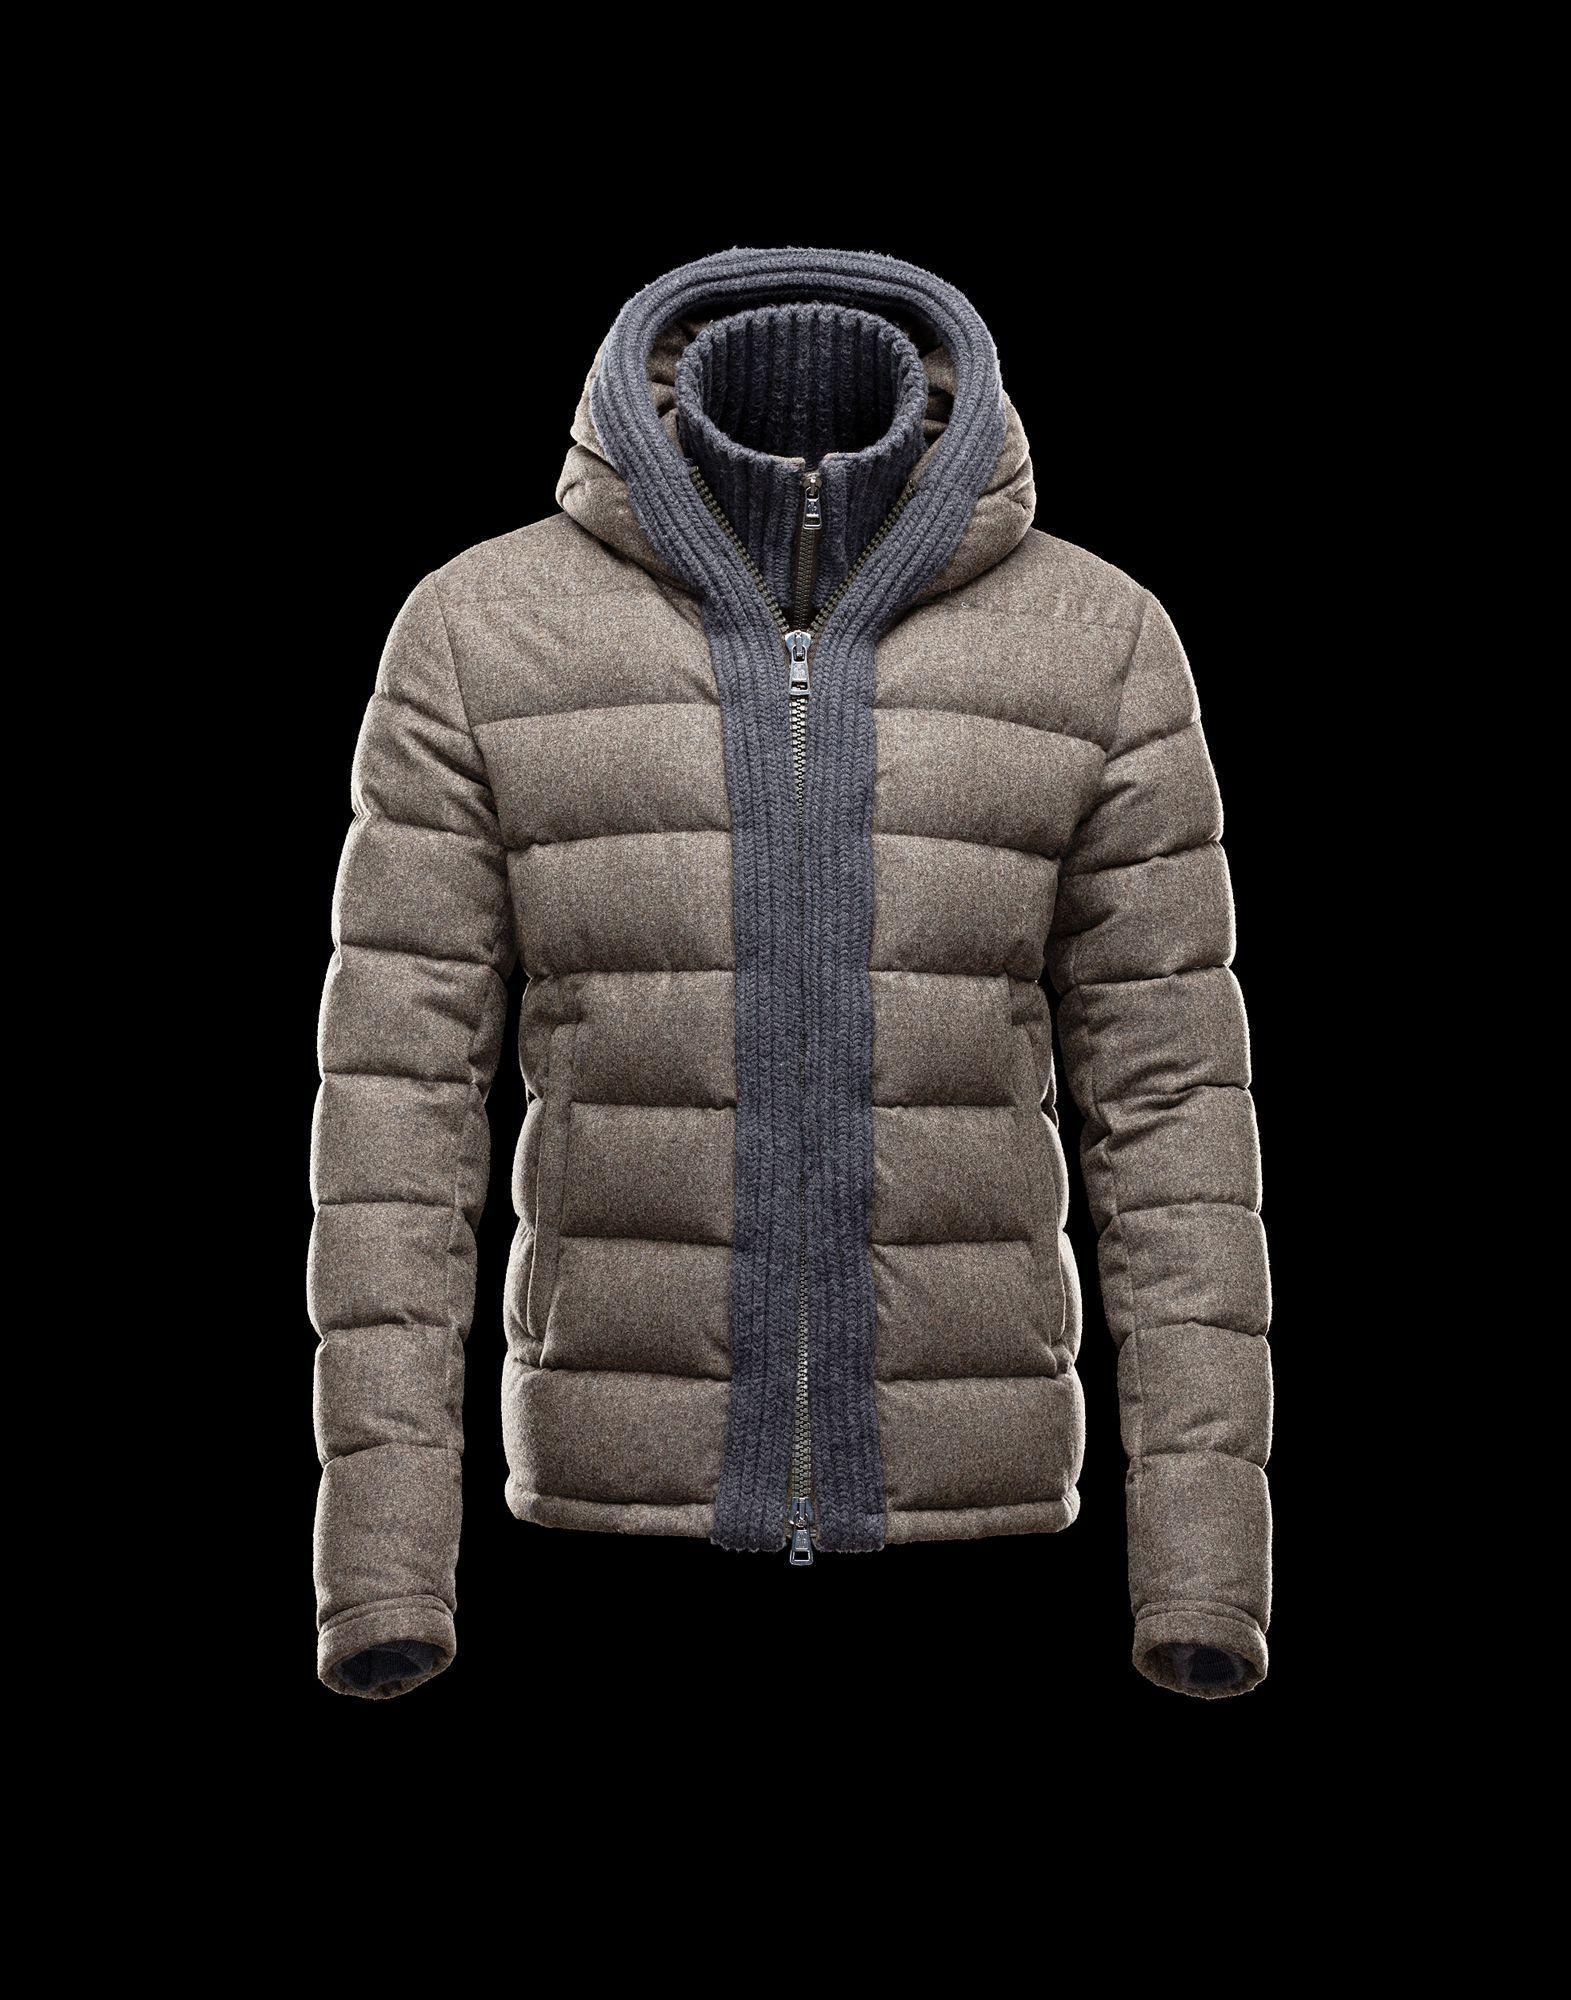 moncler winter jacket mens